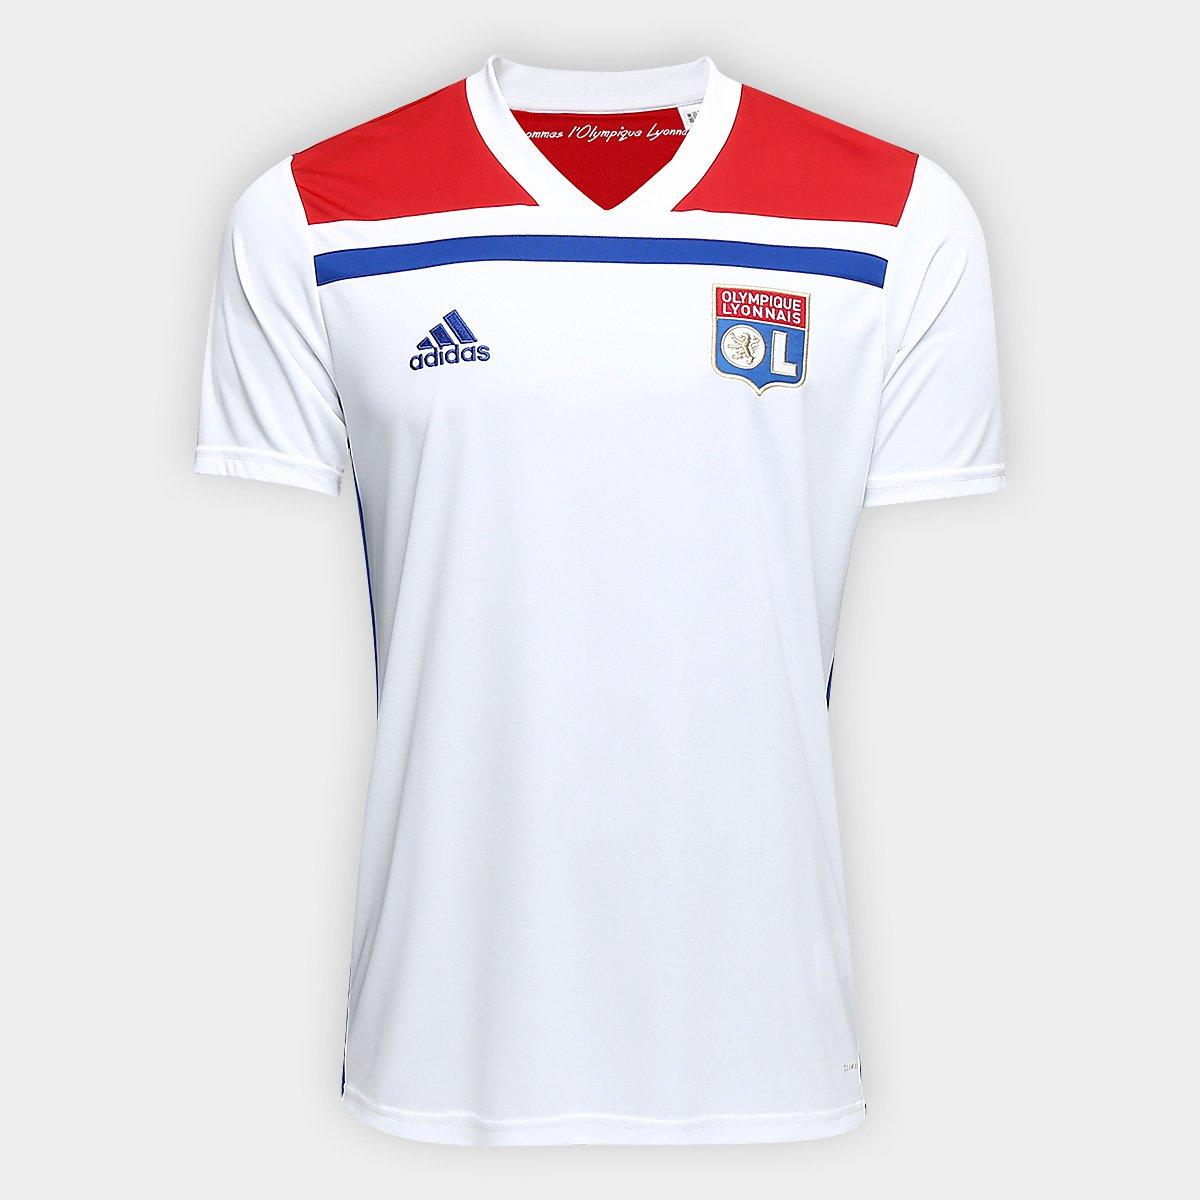 514fe8627a Camisa Lyon Home 2018 s n° - Torcedor Adidas Masculina - Branco e ...